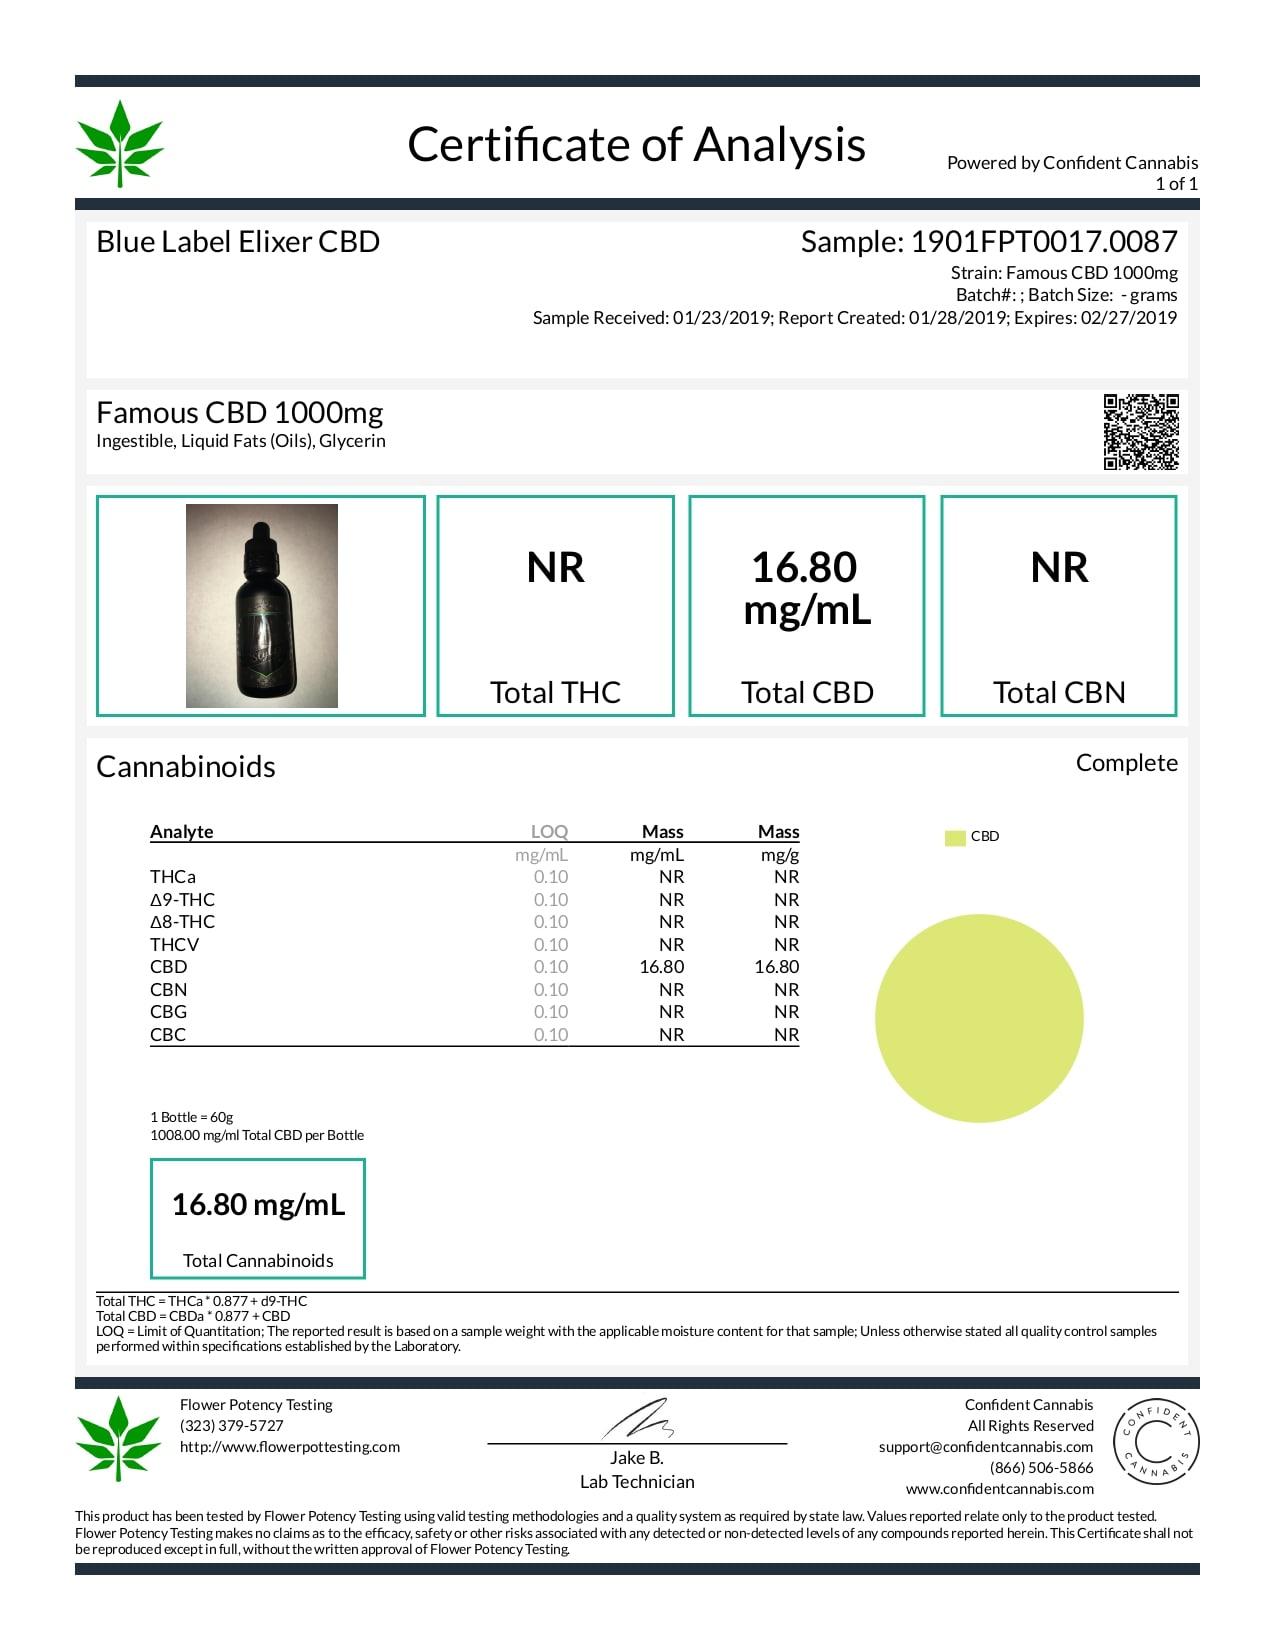 Blue Label CBD Vape Juice Famous! 1000mg Lab Report